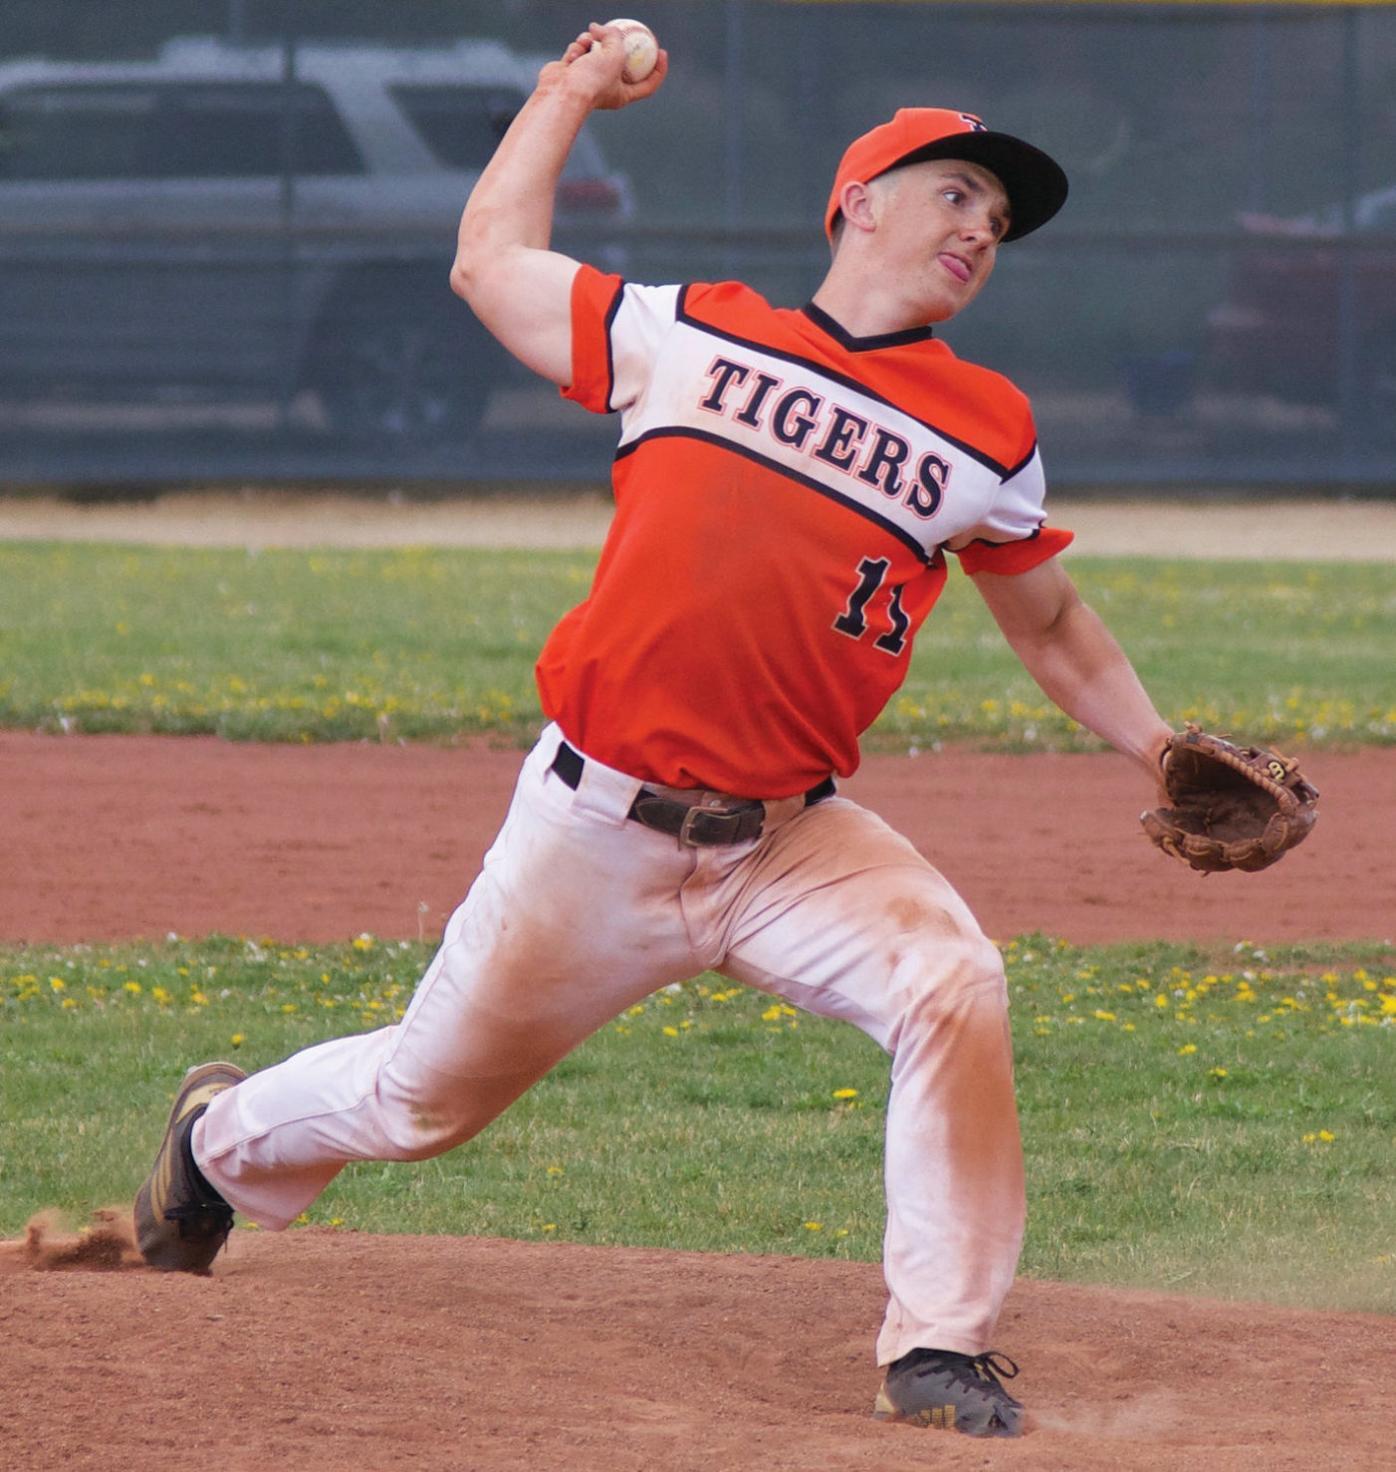 Taos Tigers baseball brings their winning streak to four games